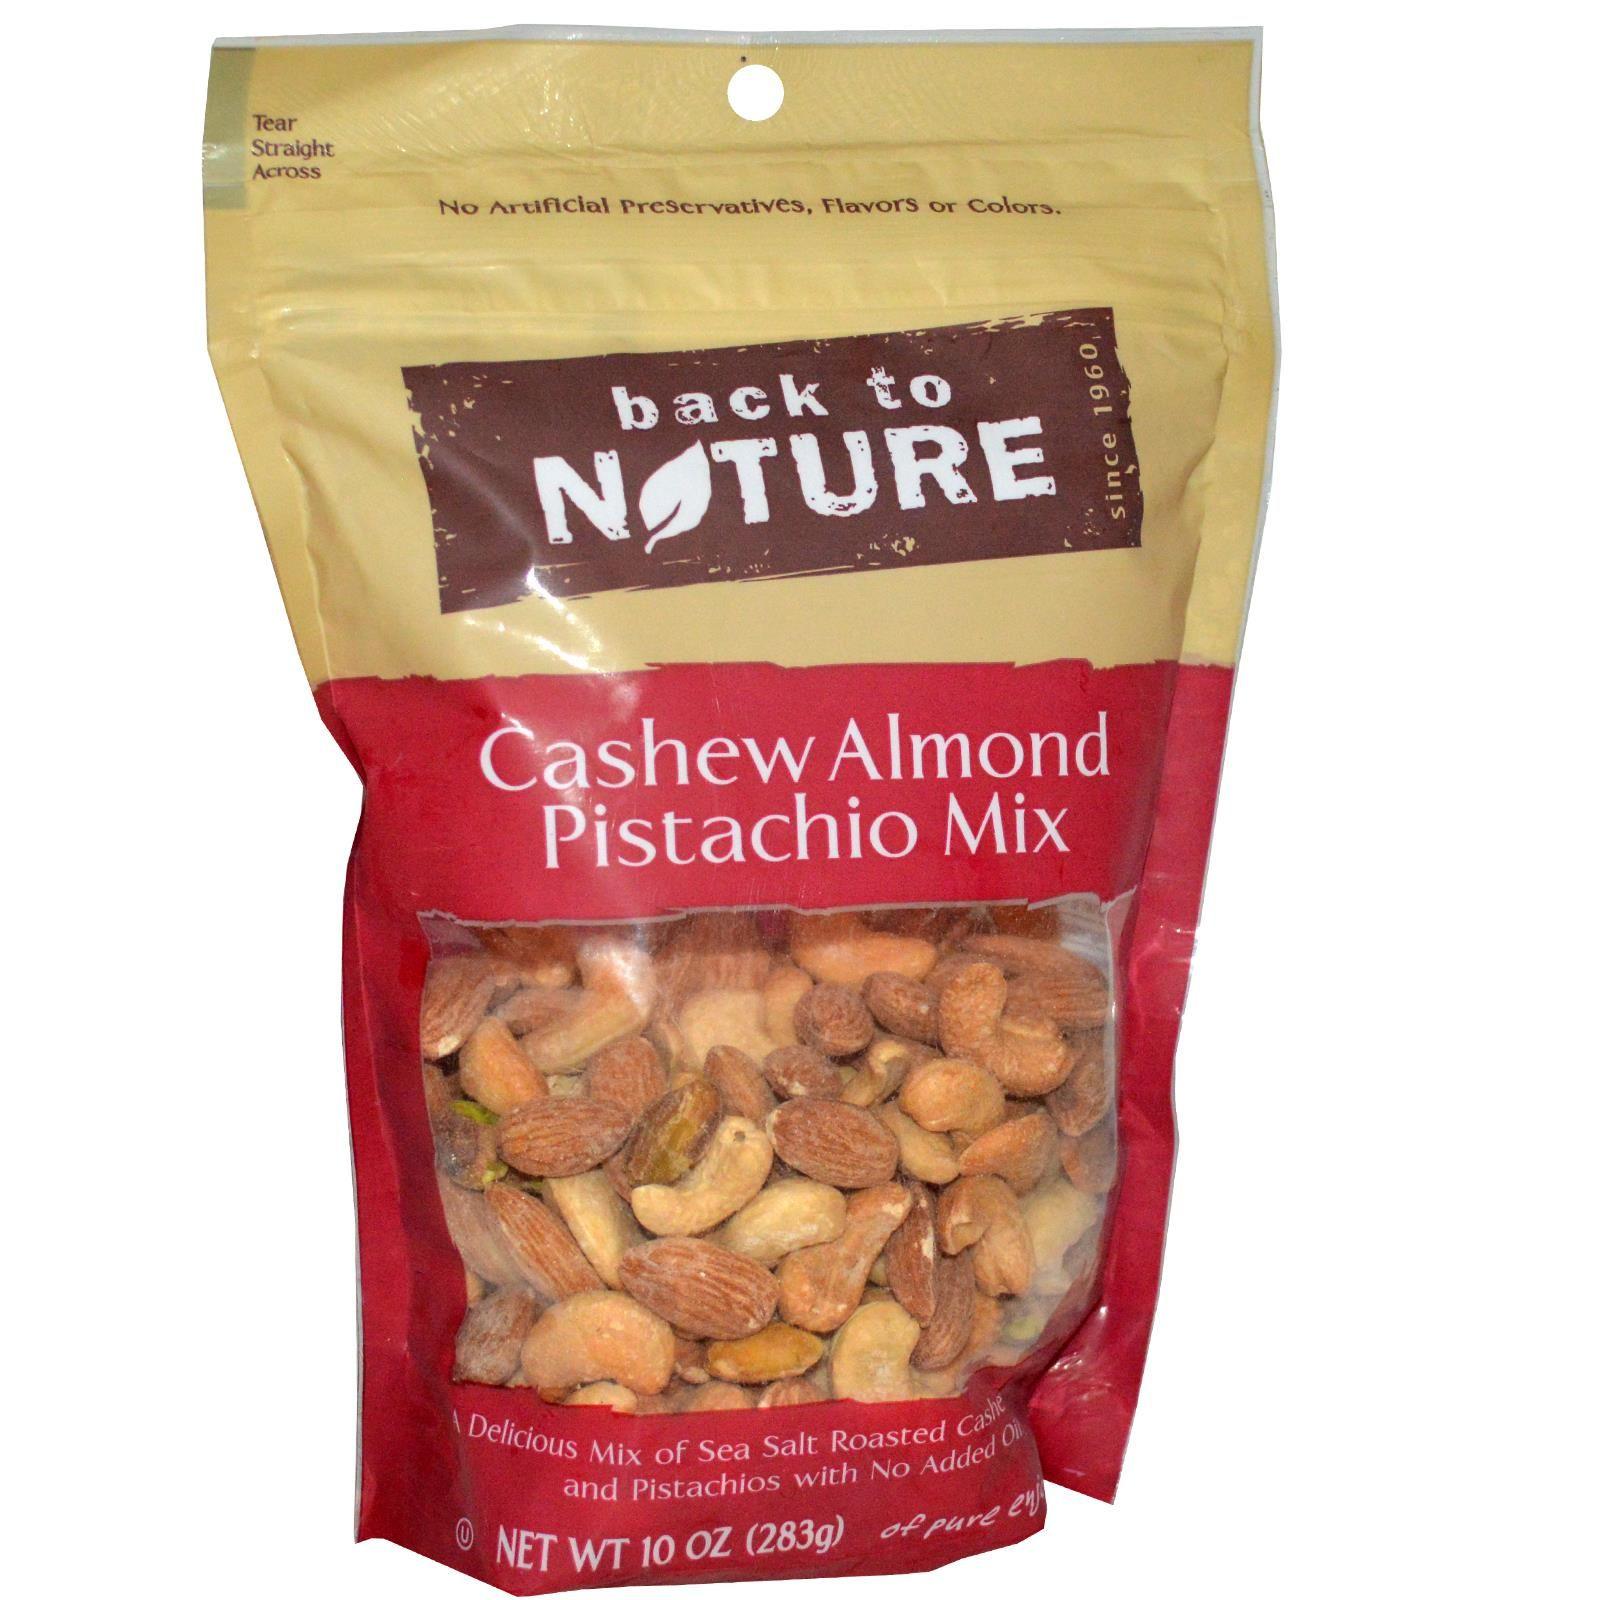 Back to Nature, Cashew Almond Pistachio Mix, 10 oz